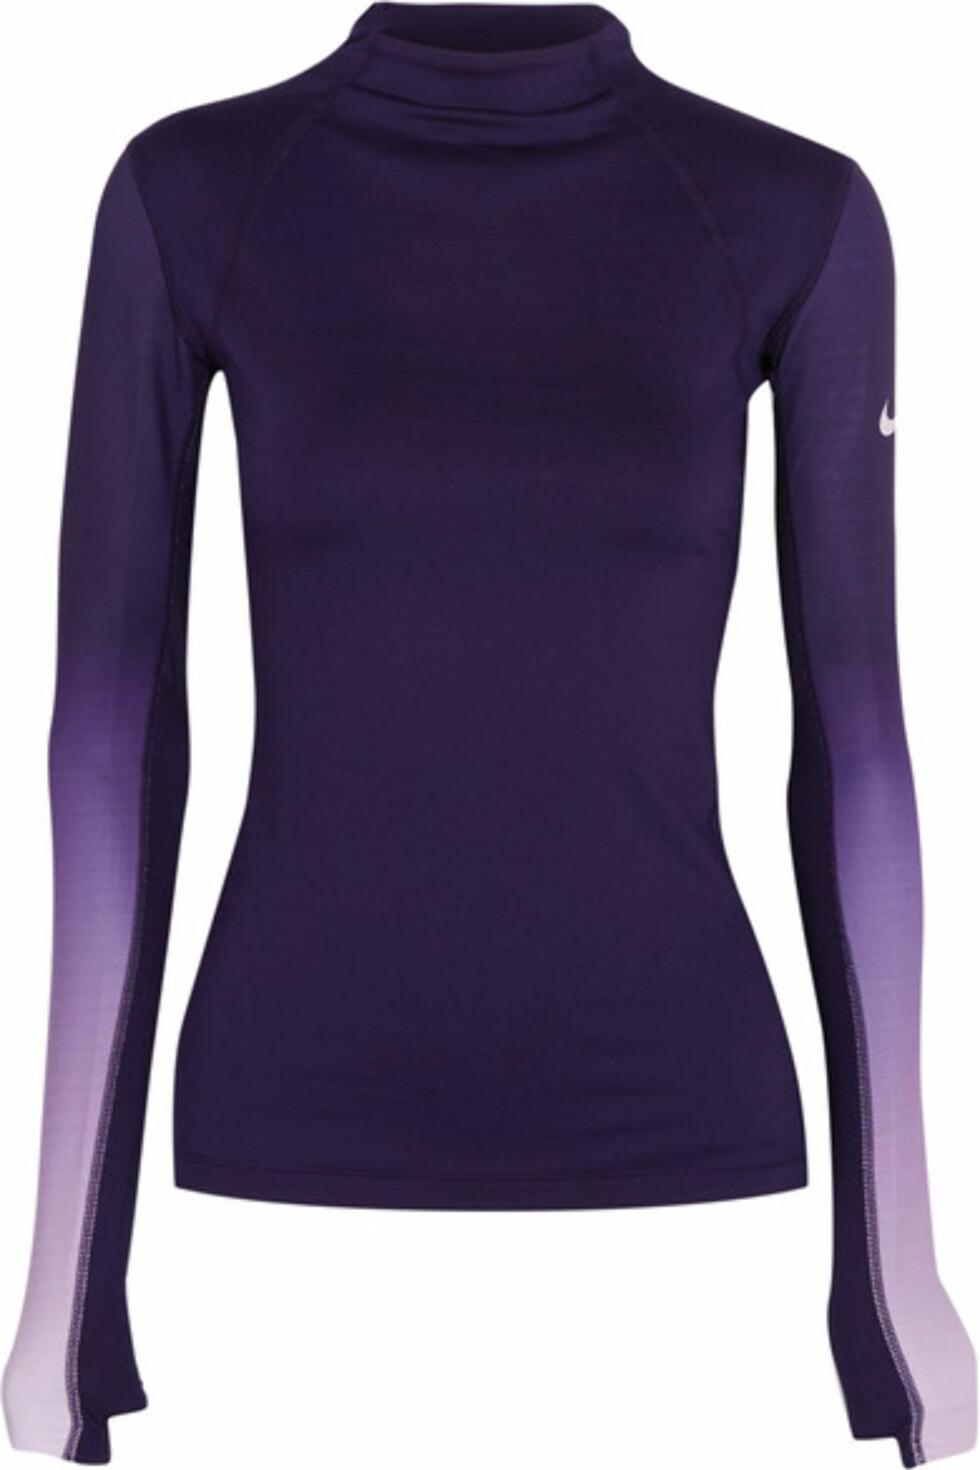 Overdel fra Nike via Net-a-porter.com | kr 651 | https://www.net-a-porter.com/se/en/product/762315/nike/pro-hyperwarm-ombre-dri-fit-stretch-jersey-top